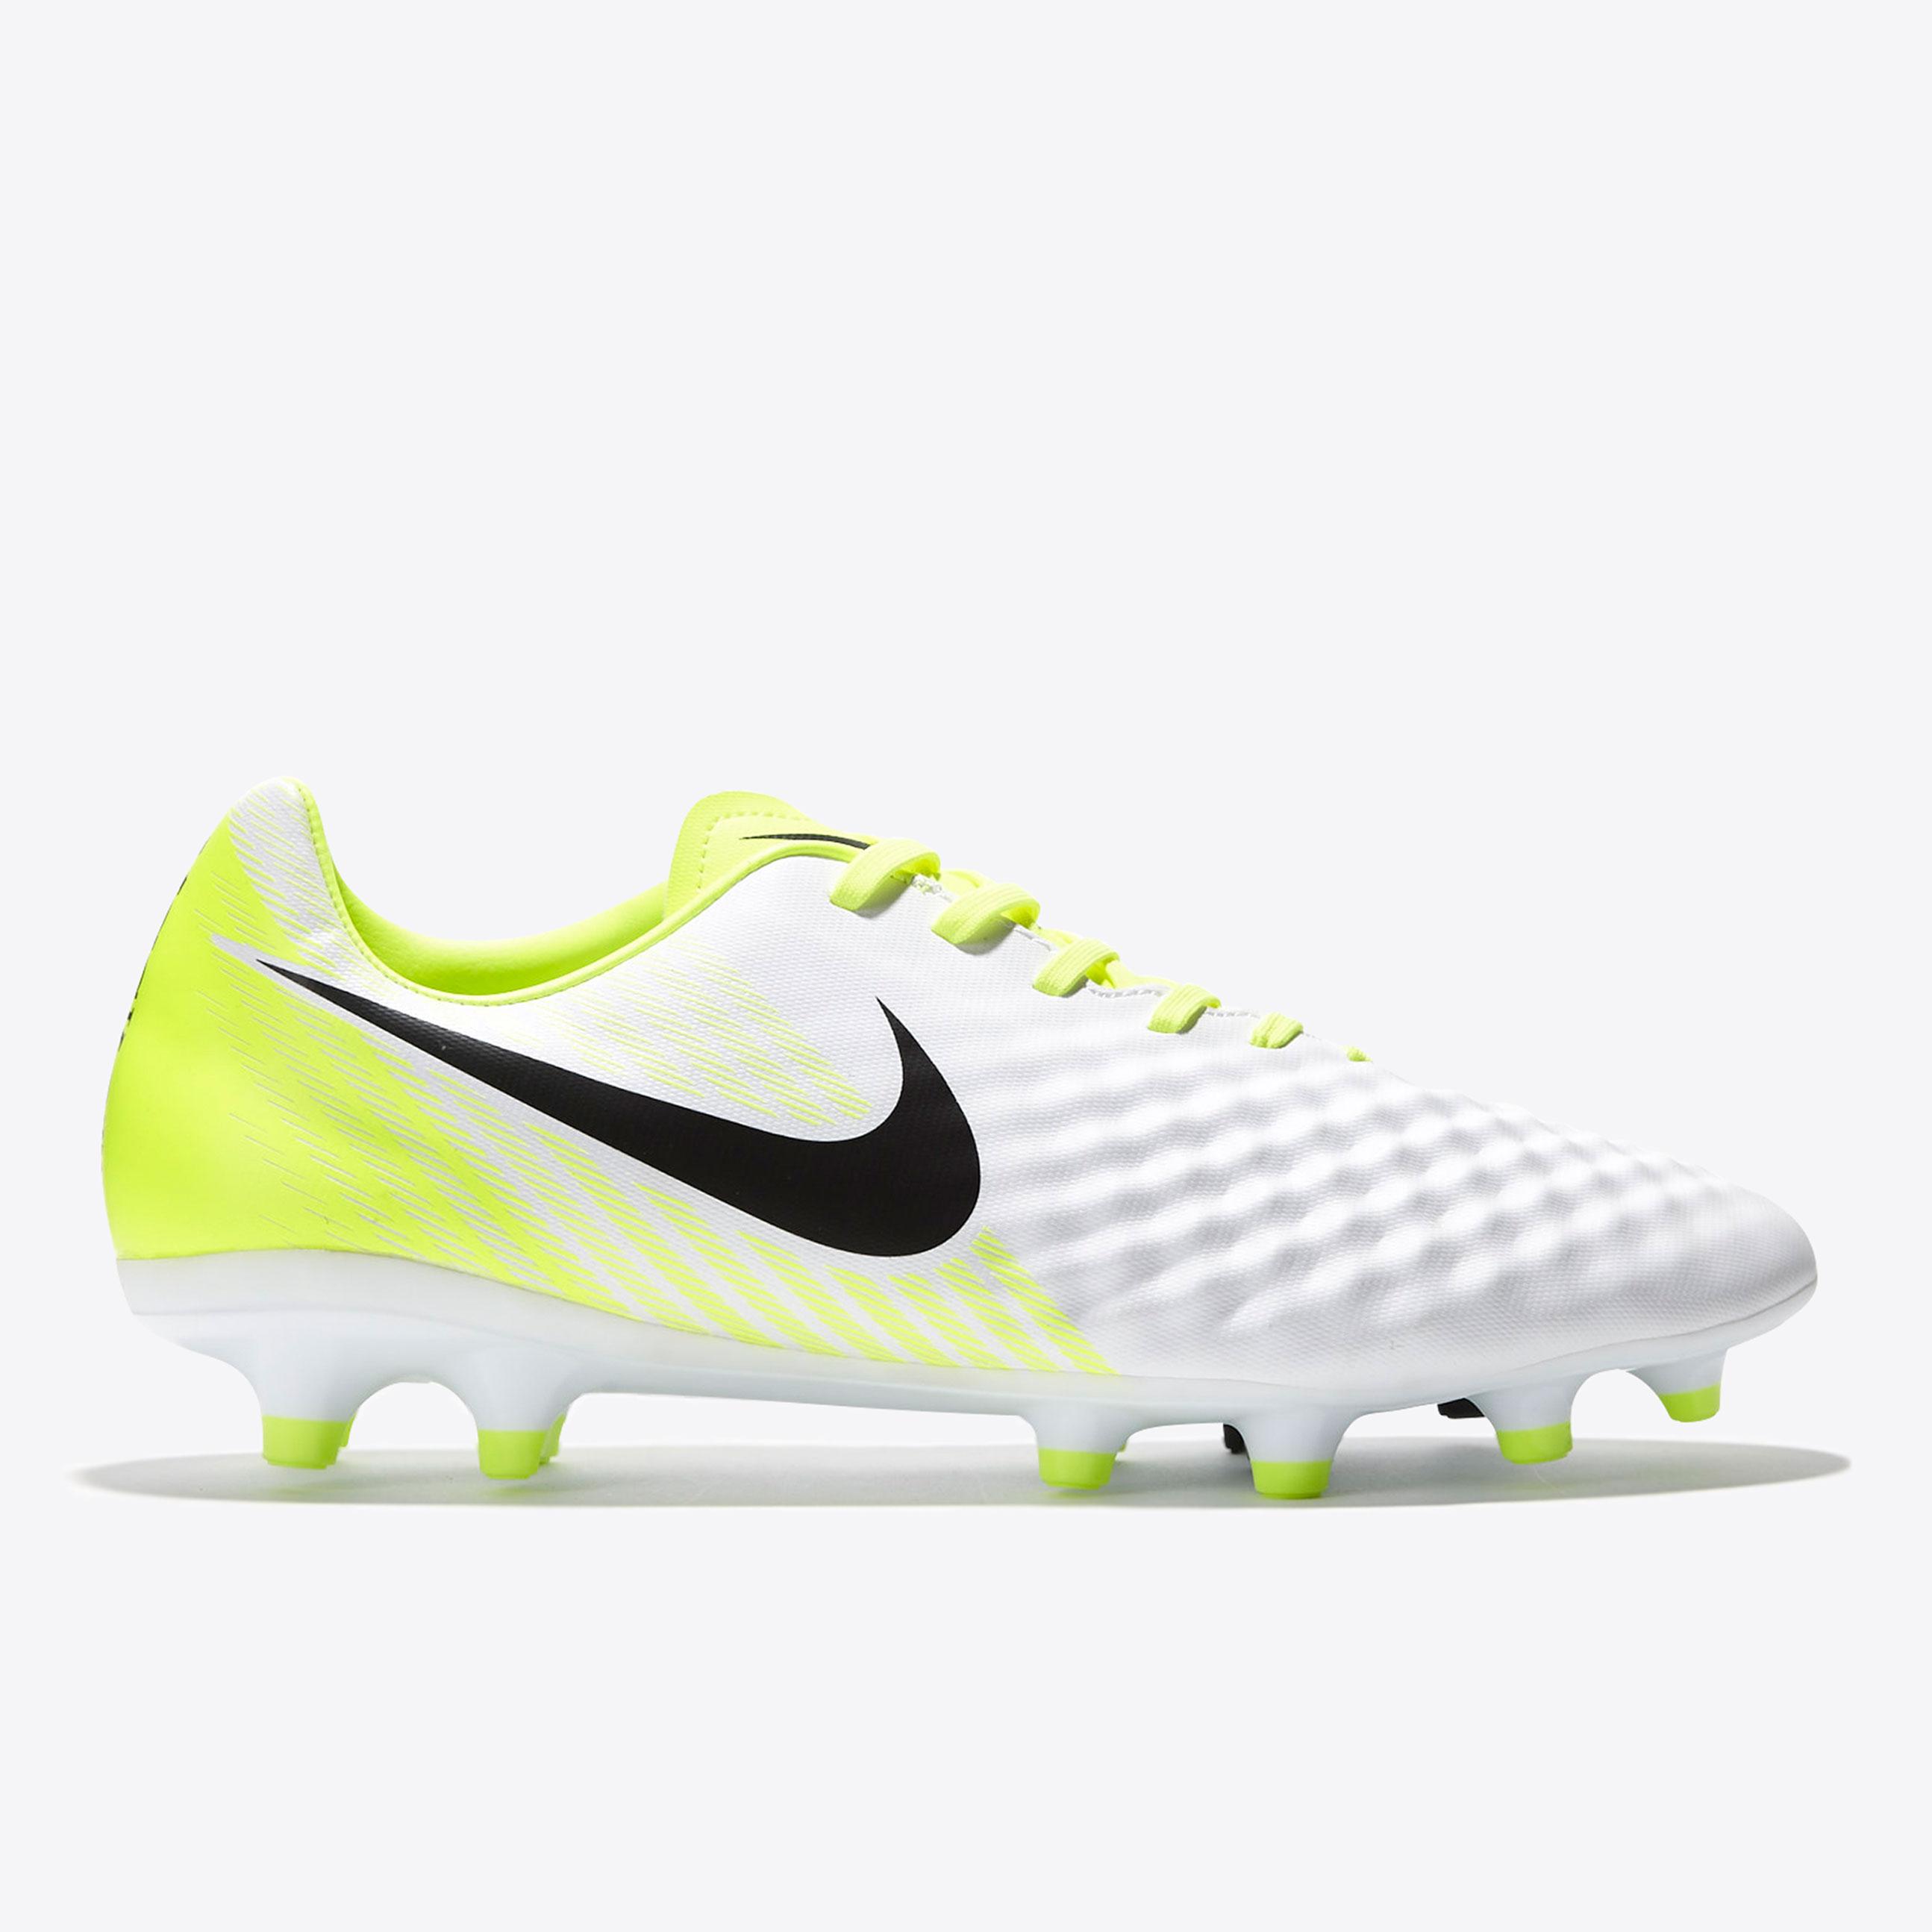 Nike Magista Onda II Firm Ground Football Boots - White/Black/Volt/Pur